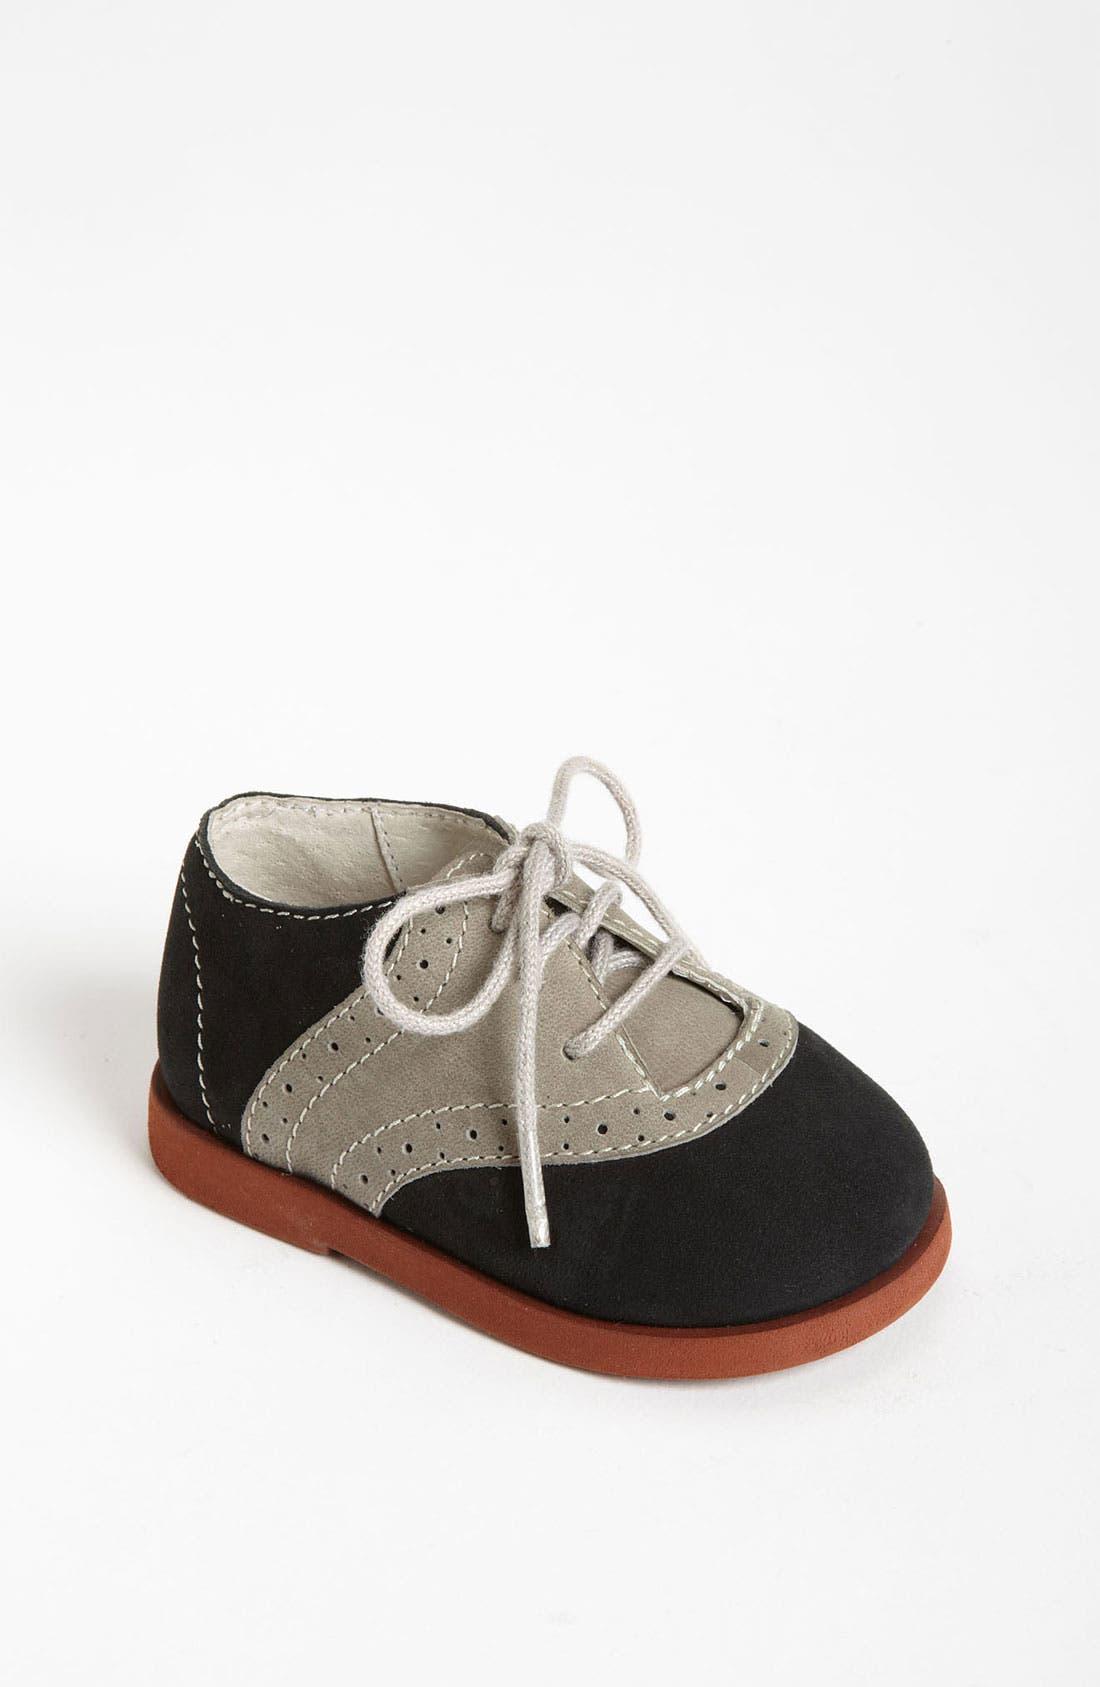 Alternate Image 1 Selected - Nordstrom Baby 'Wesley' Saddle Shoe (Baby)